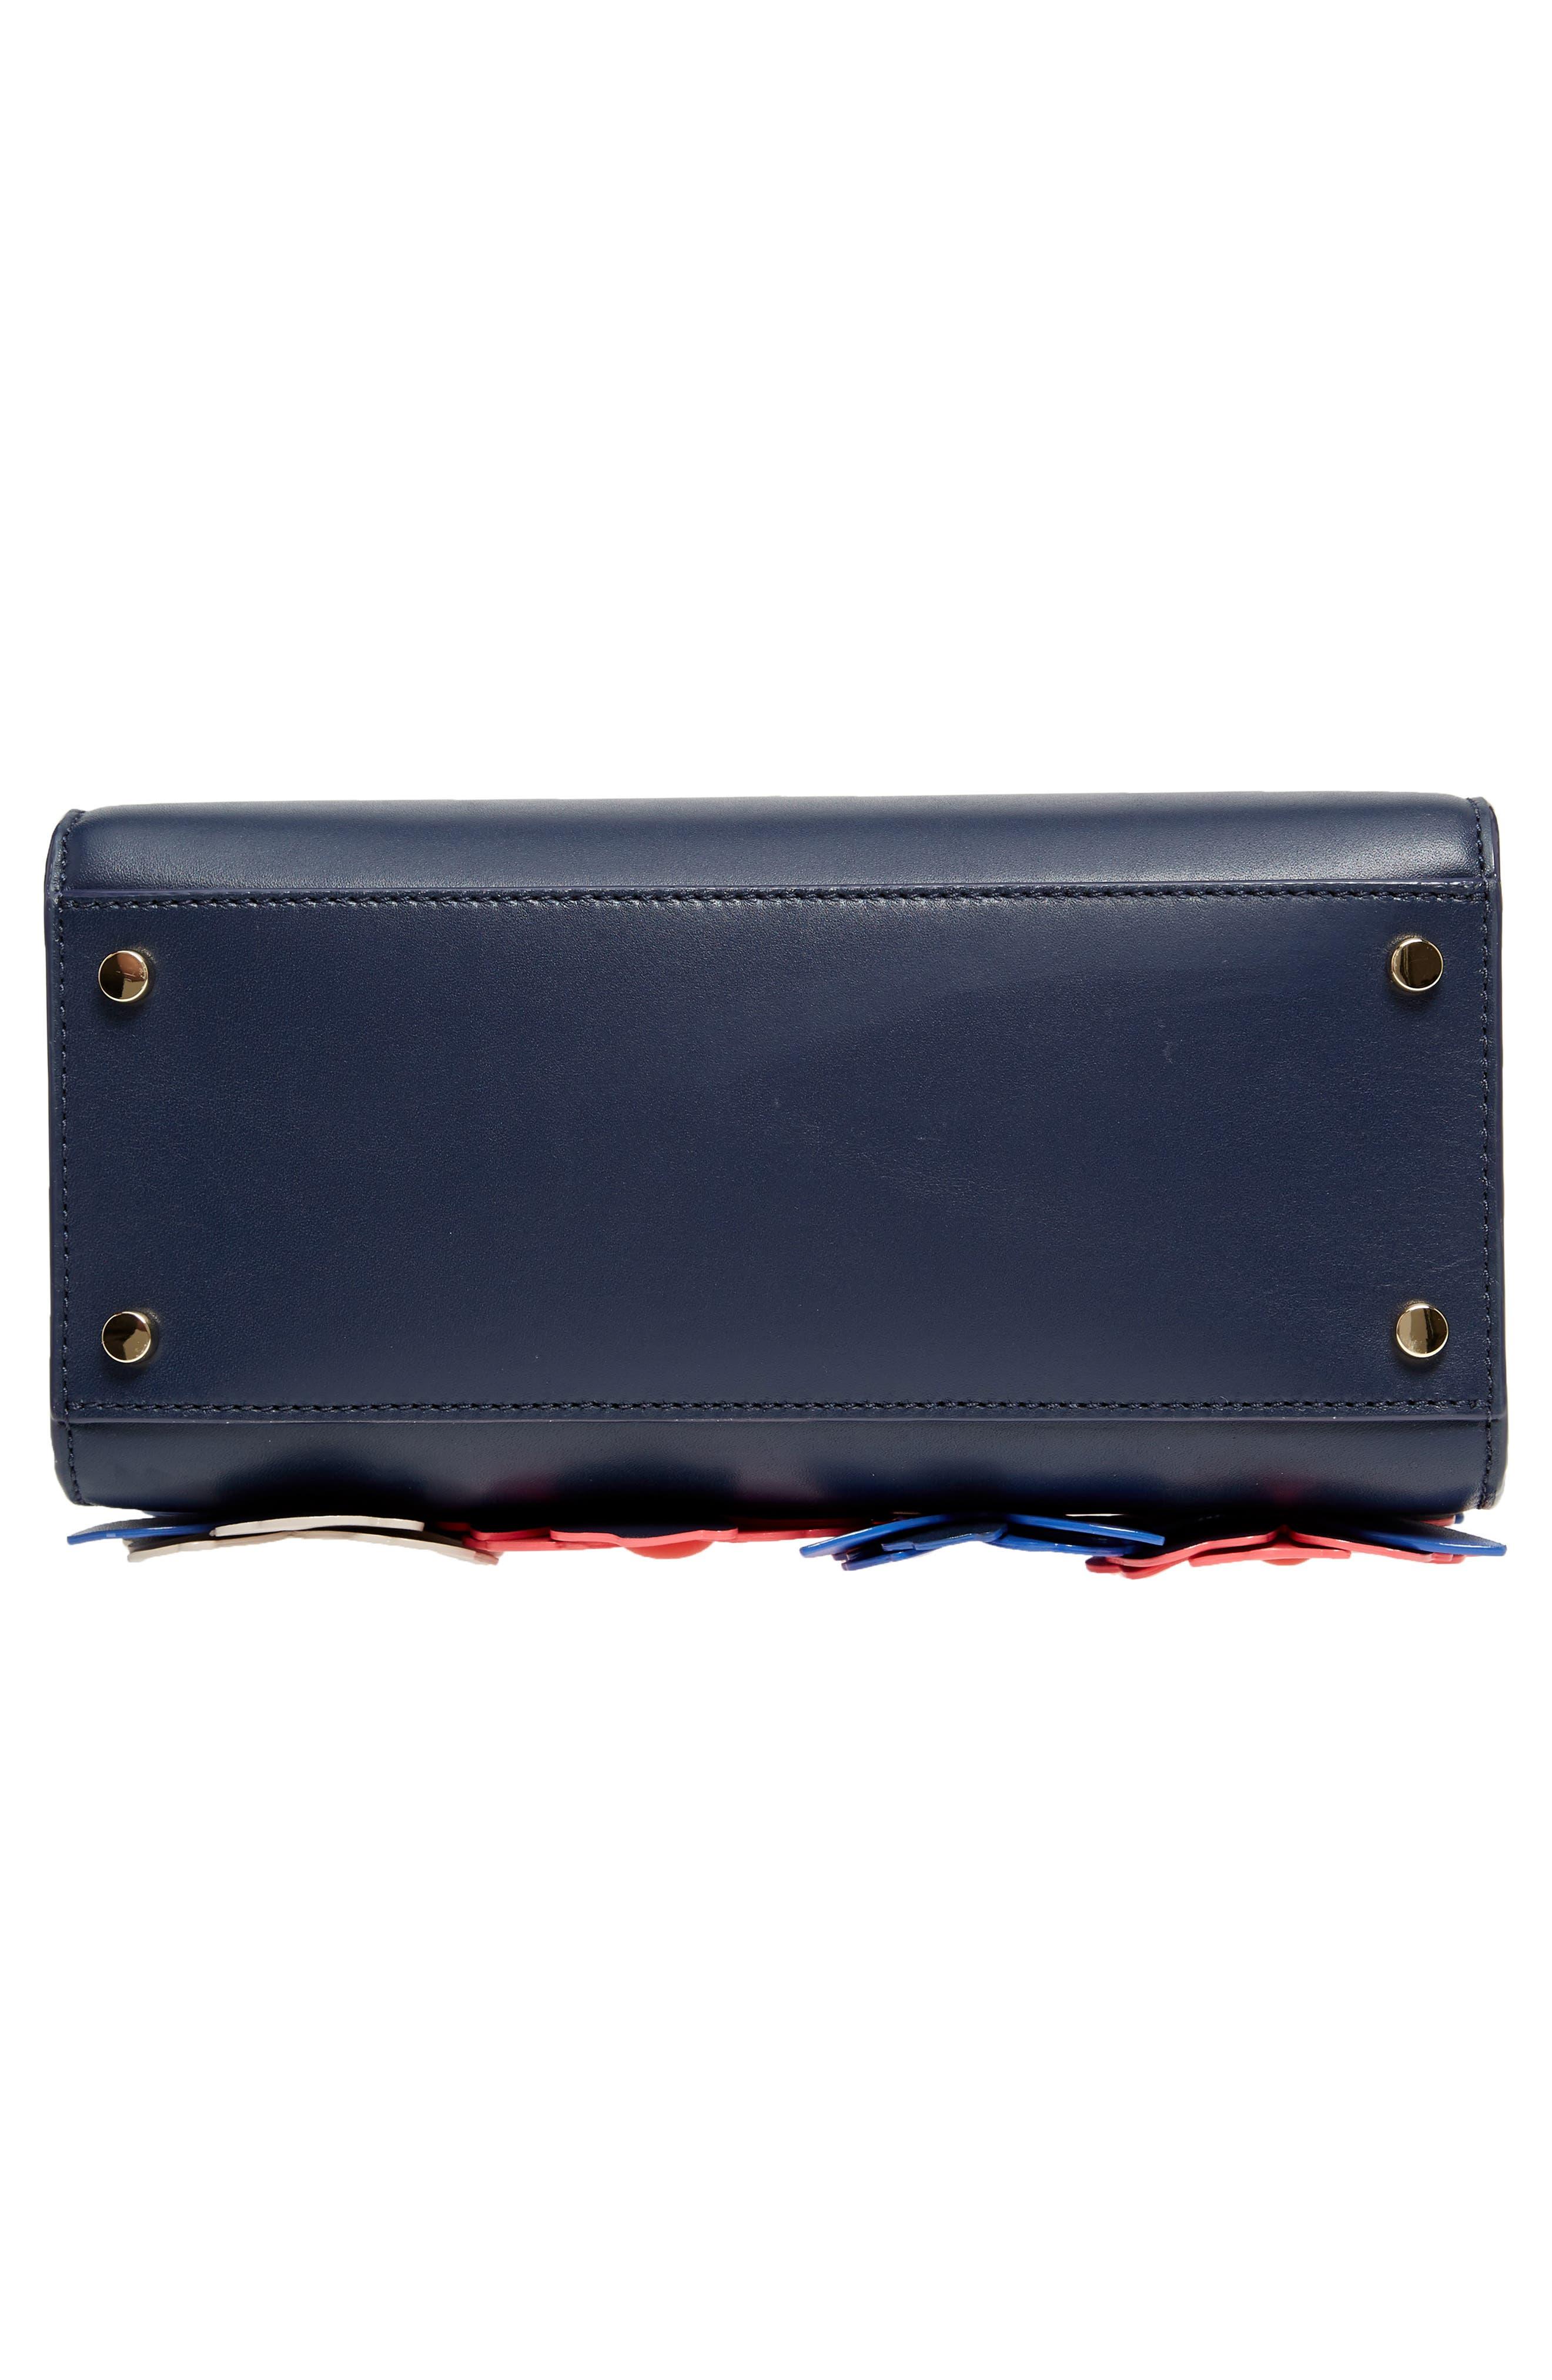 madison daisy lane – sam leather handbag,                             Alternate thumbnail 6, color,                             400